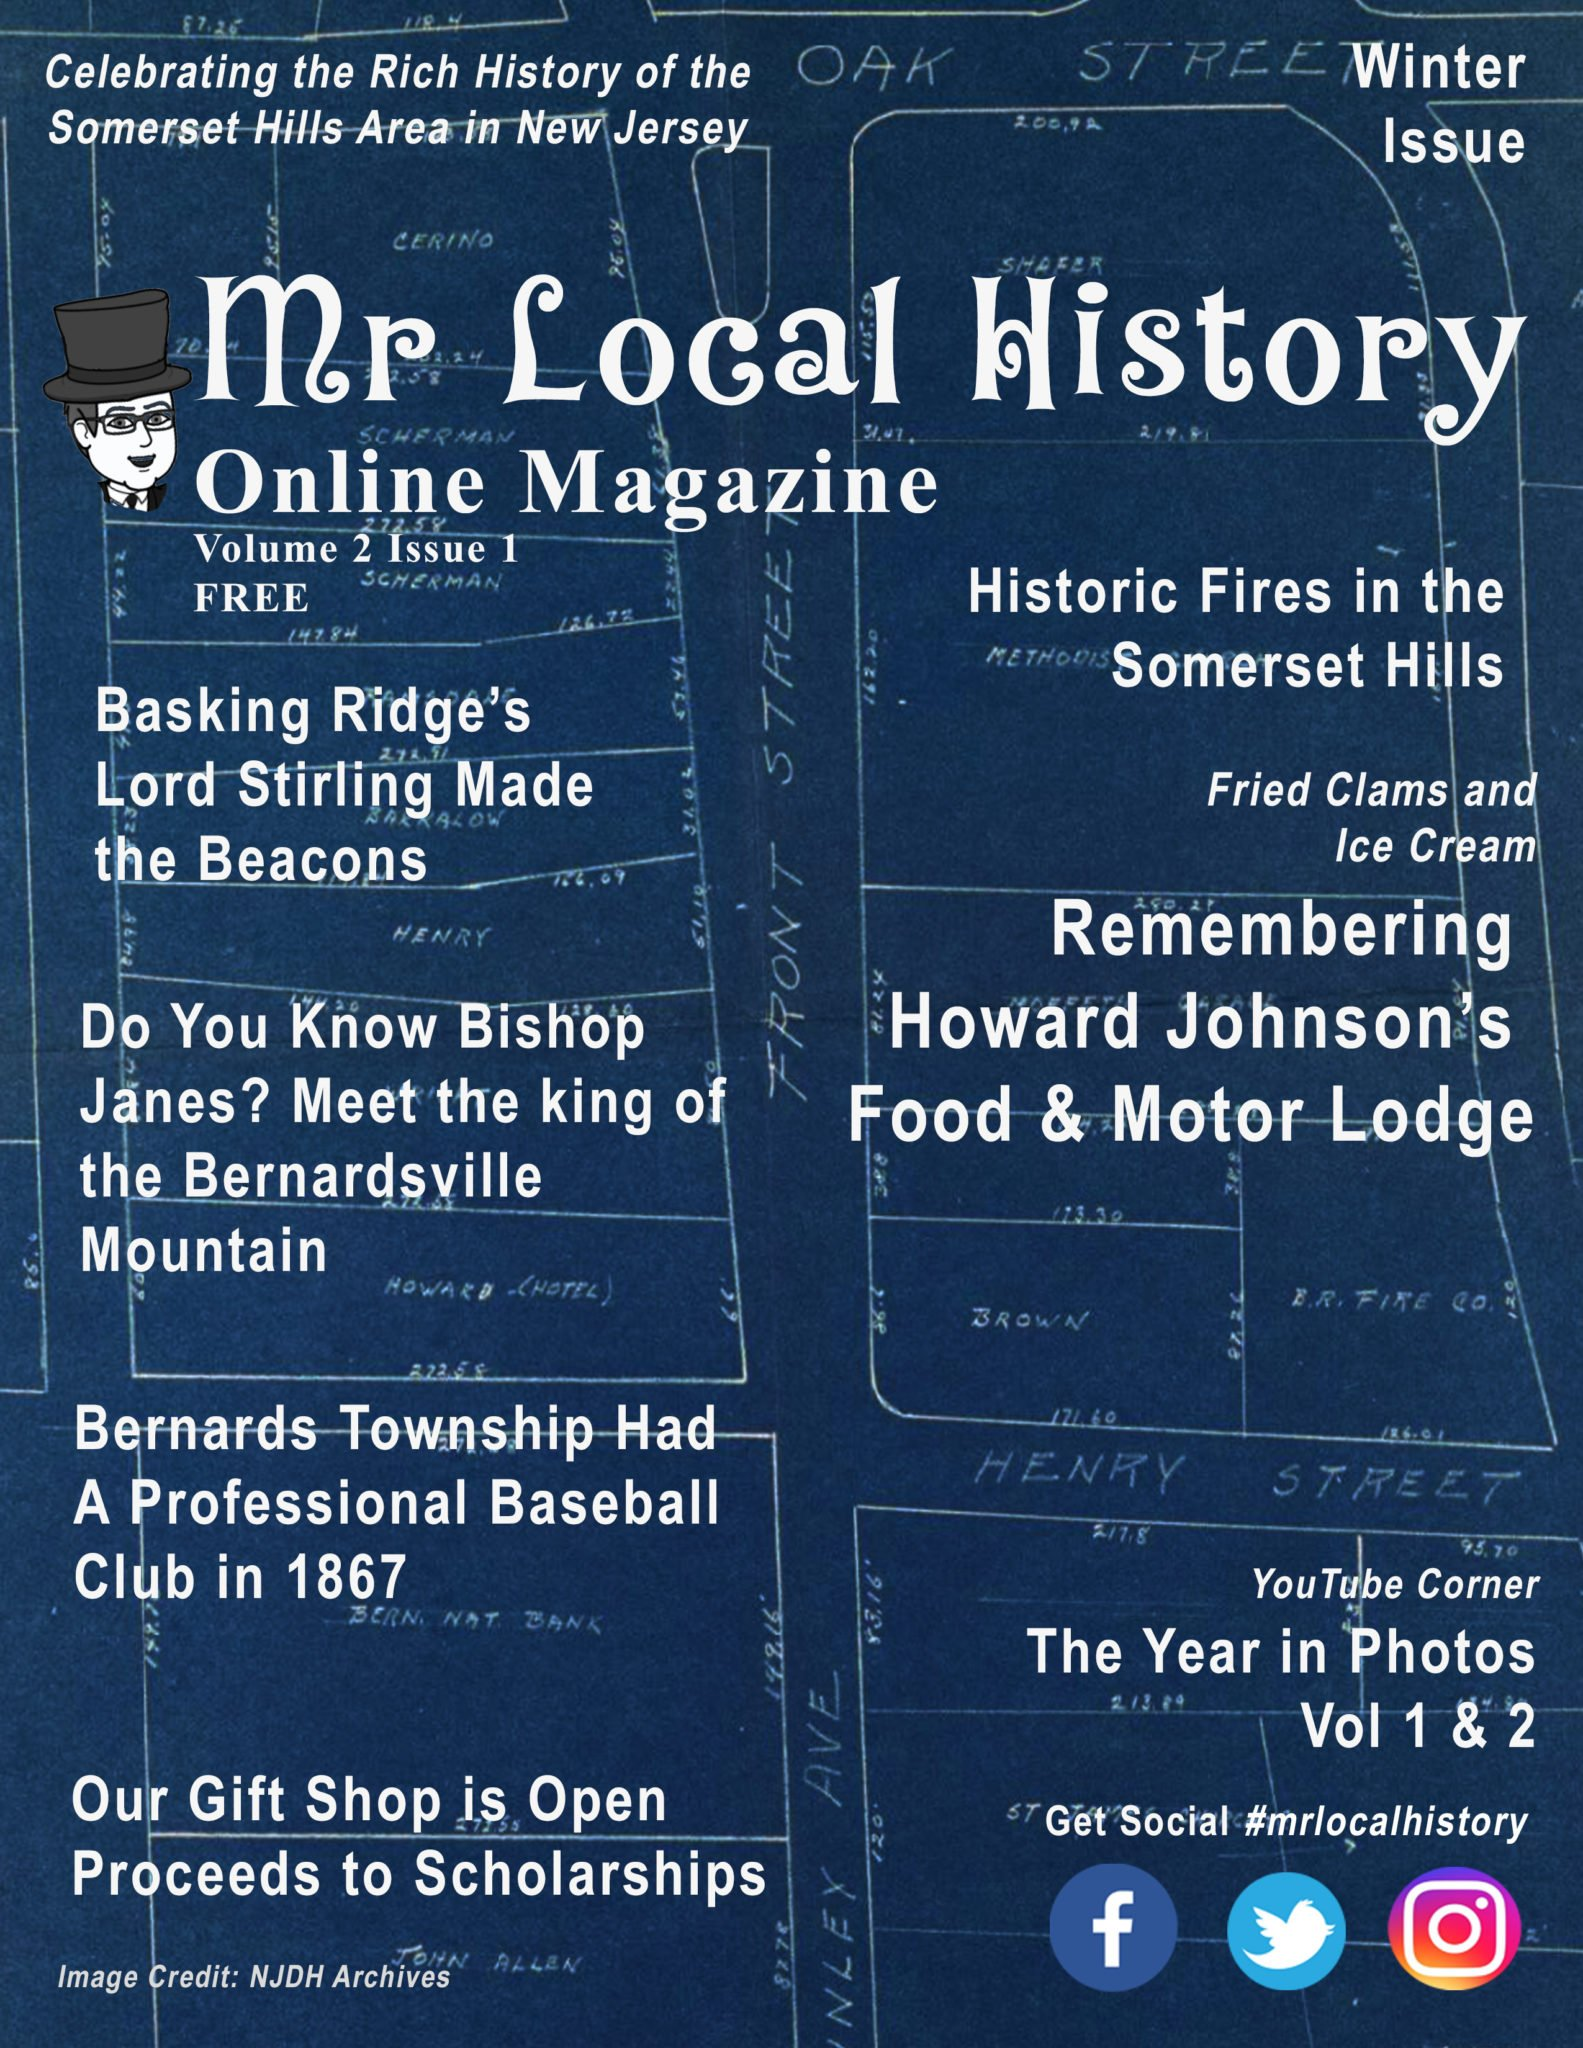 Mr-local-history-magazine-vol2-issue-1